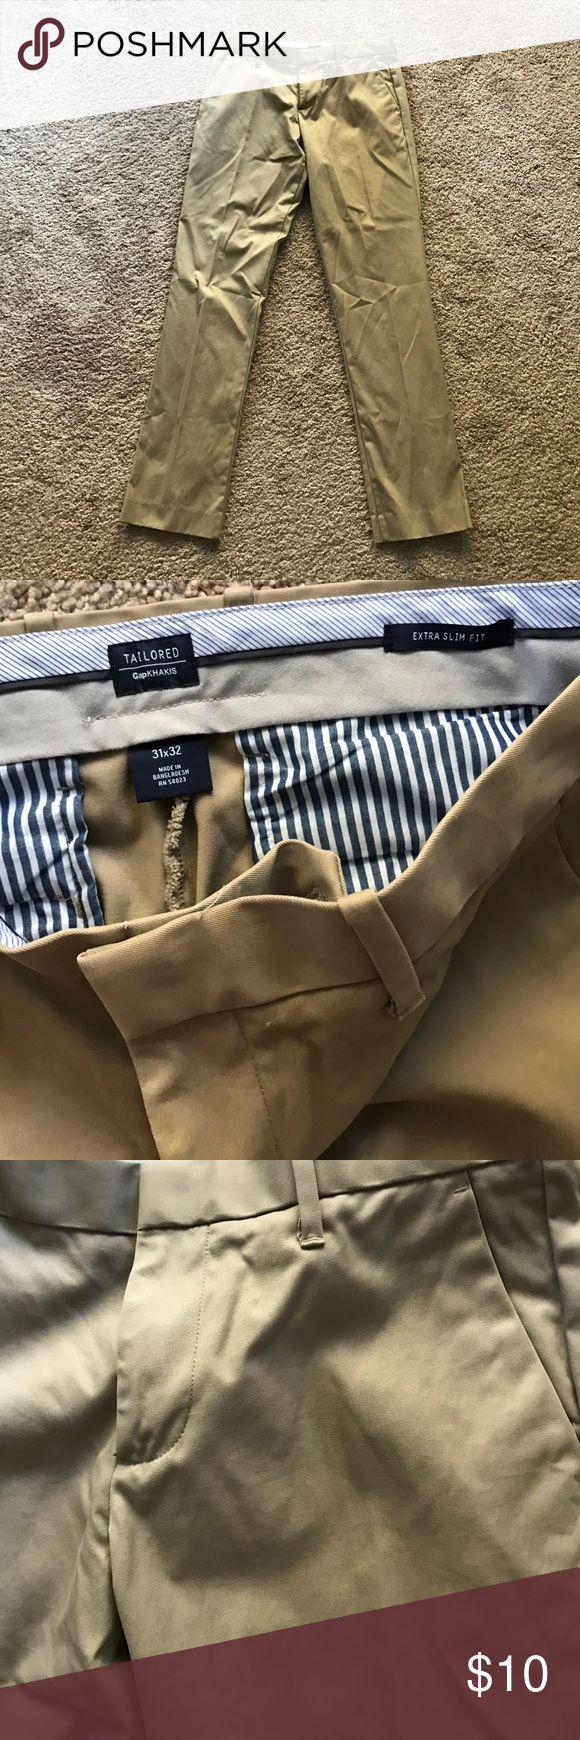 Men's Gap Extra Slim Fit Khakis Super nice quality, barley worn. GAP Pants Chinos & Khakis